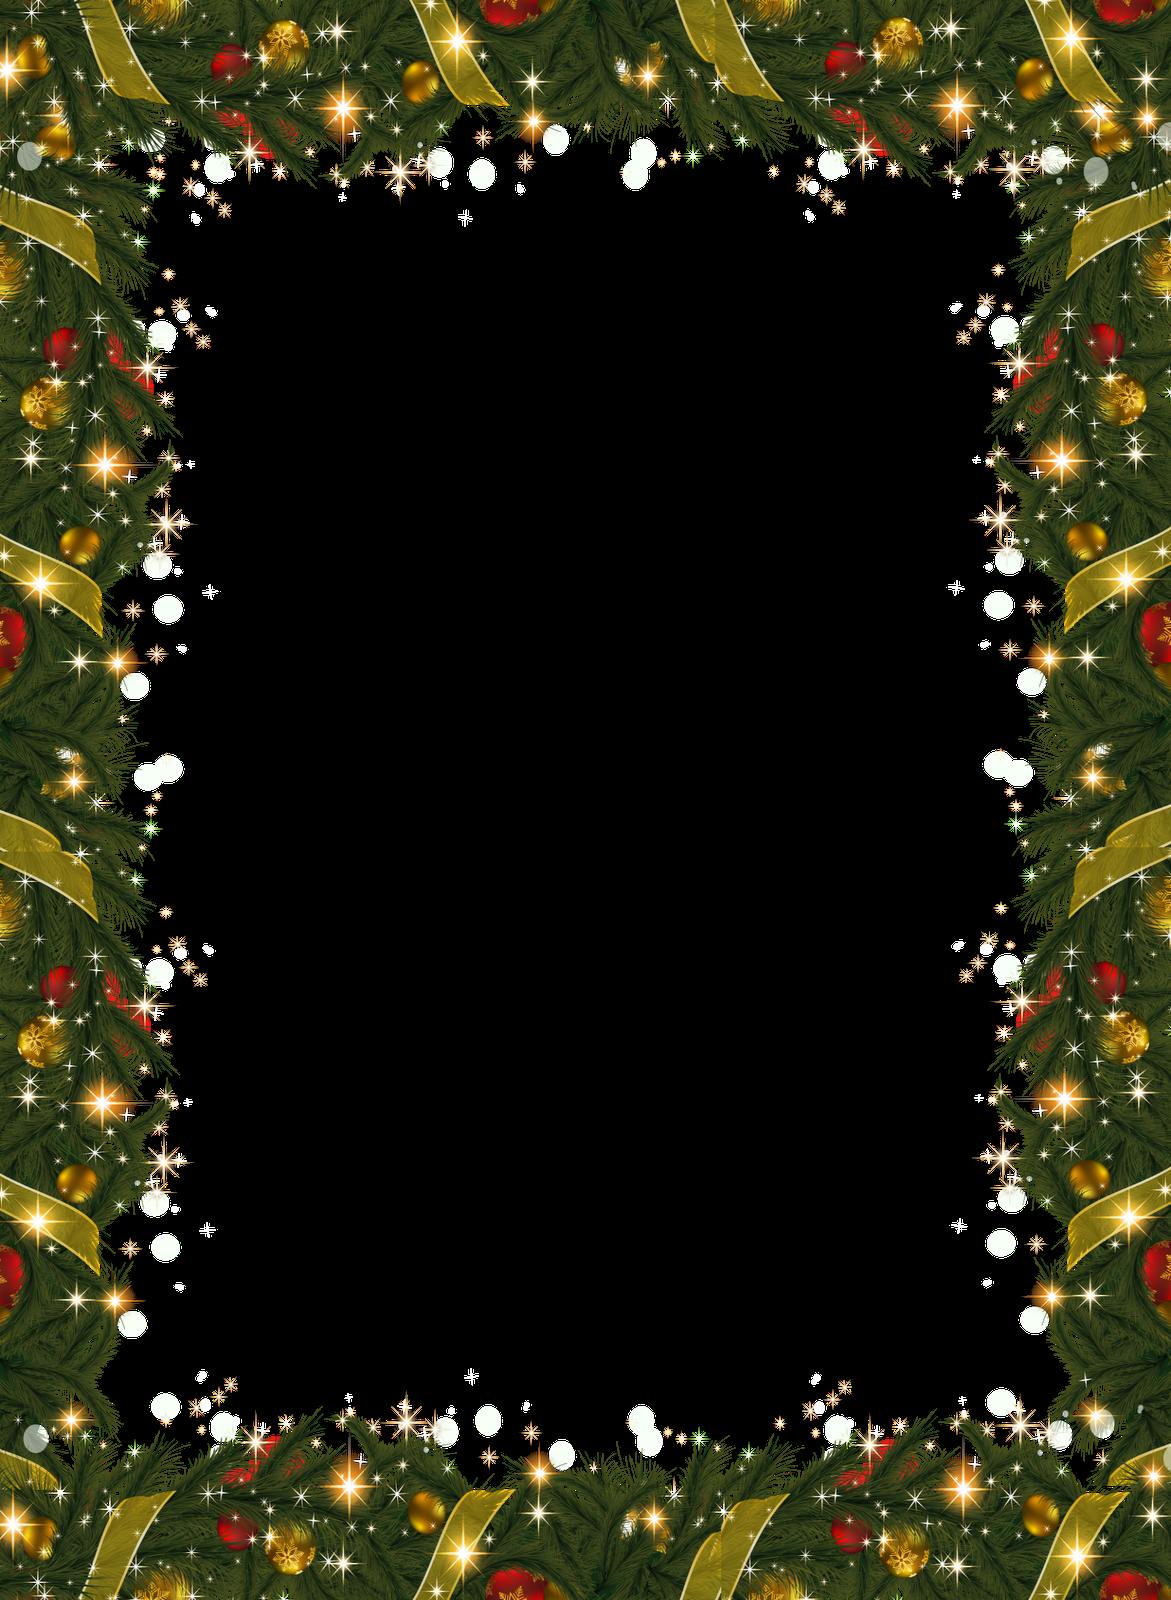 holiday photo frames free | Allcanwear.org